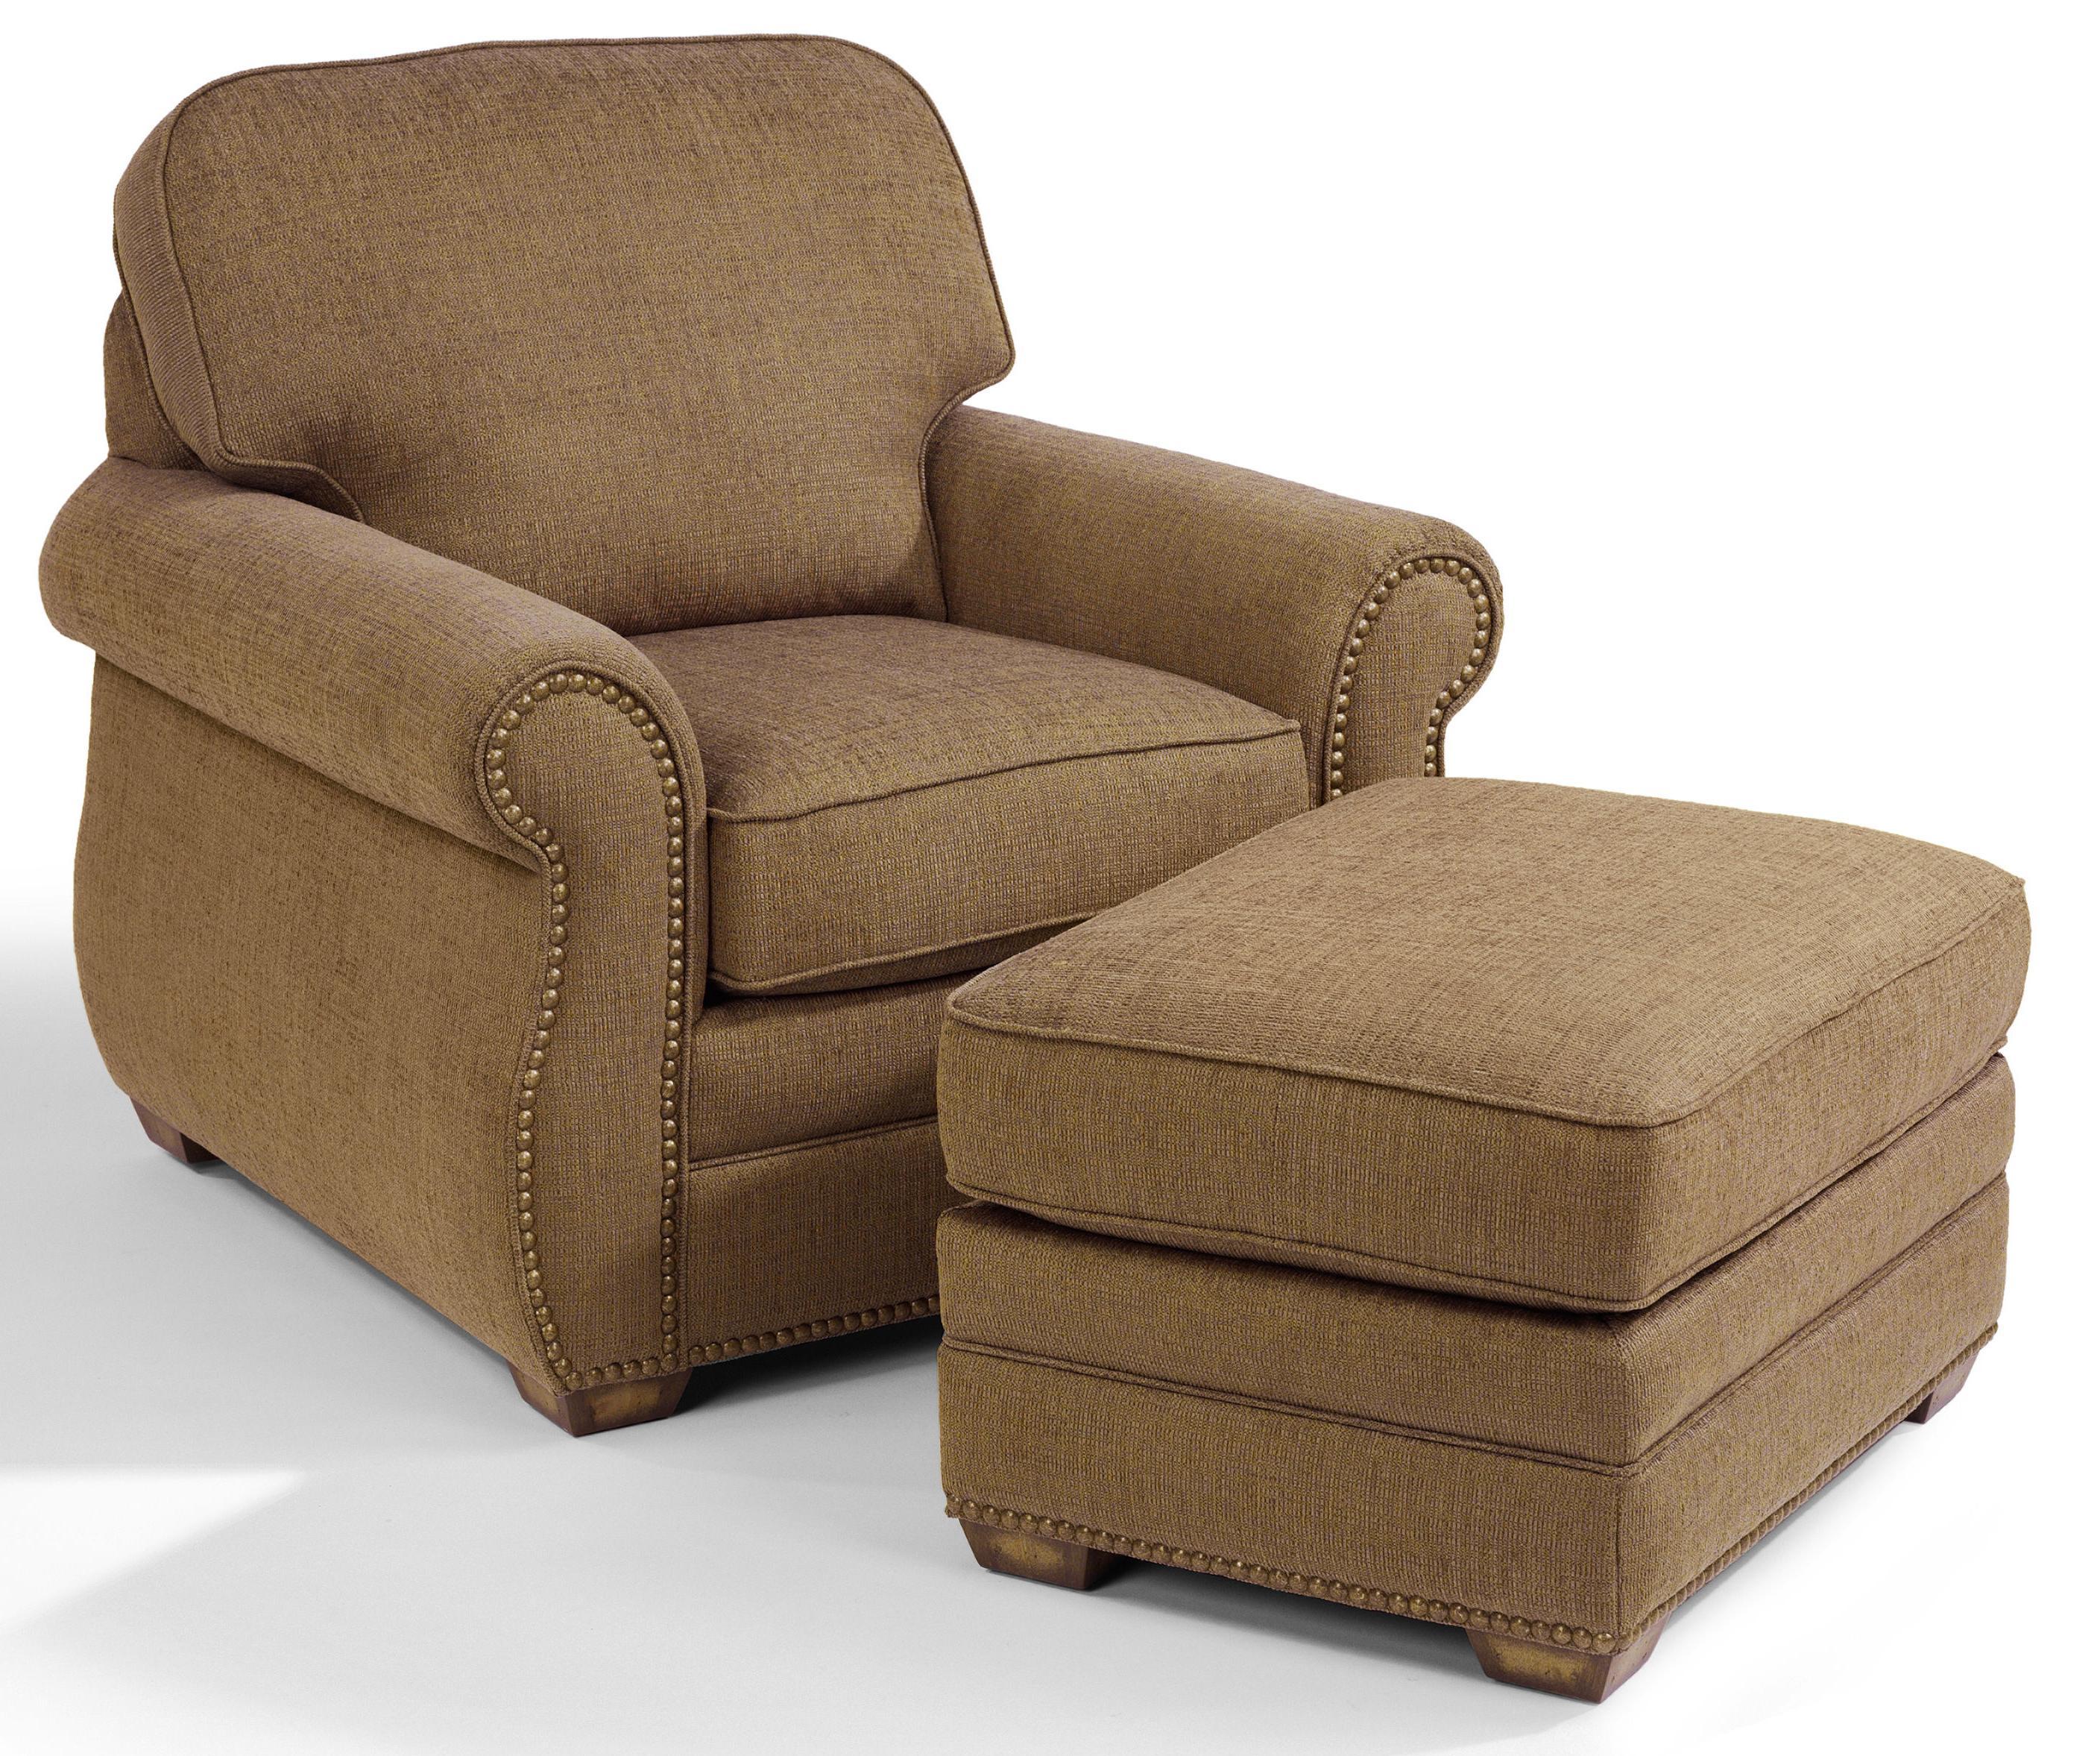 Flexsteel Whitney 5644 08 Chair Ottoman With Wood Block Feet John V Schultz Furniture Ottoman